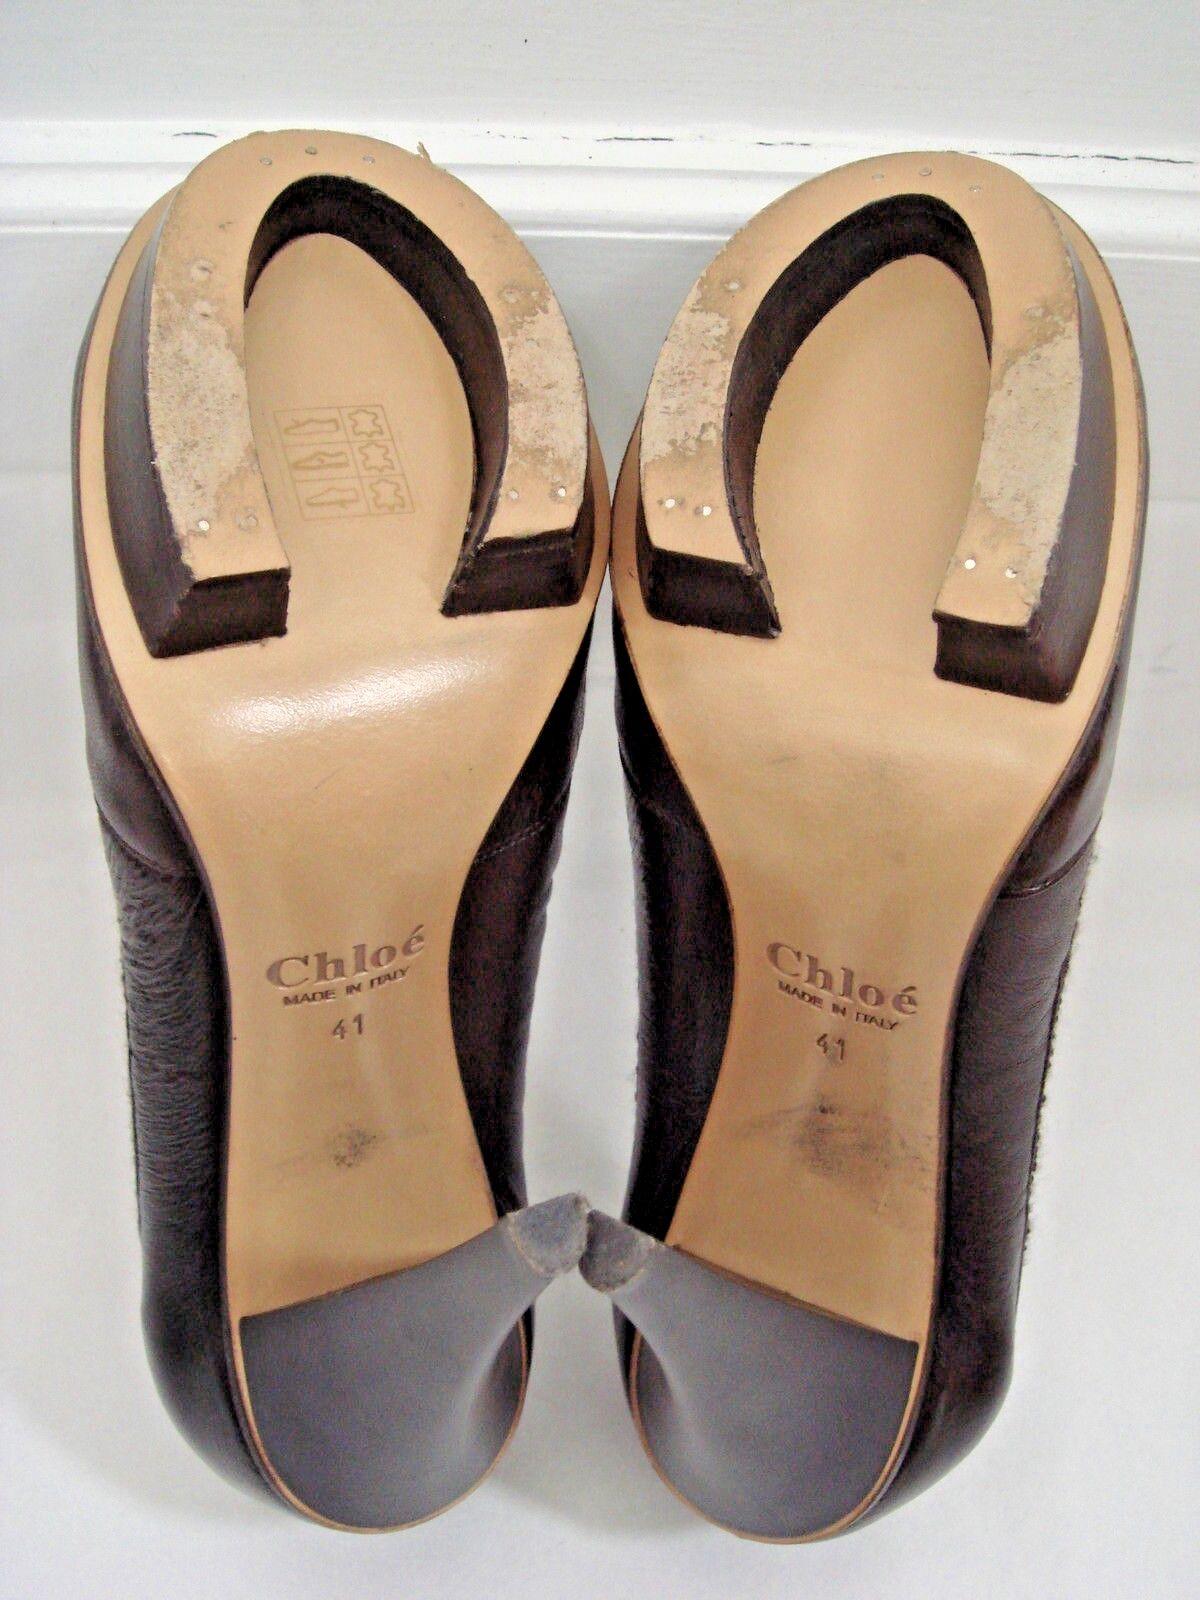 CHLOE Braun leather Italian platform heels pumps Italian leather size 41 931ca6